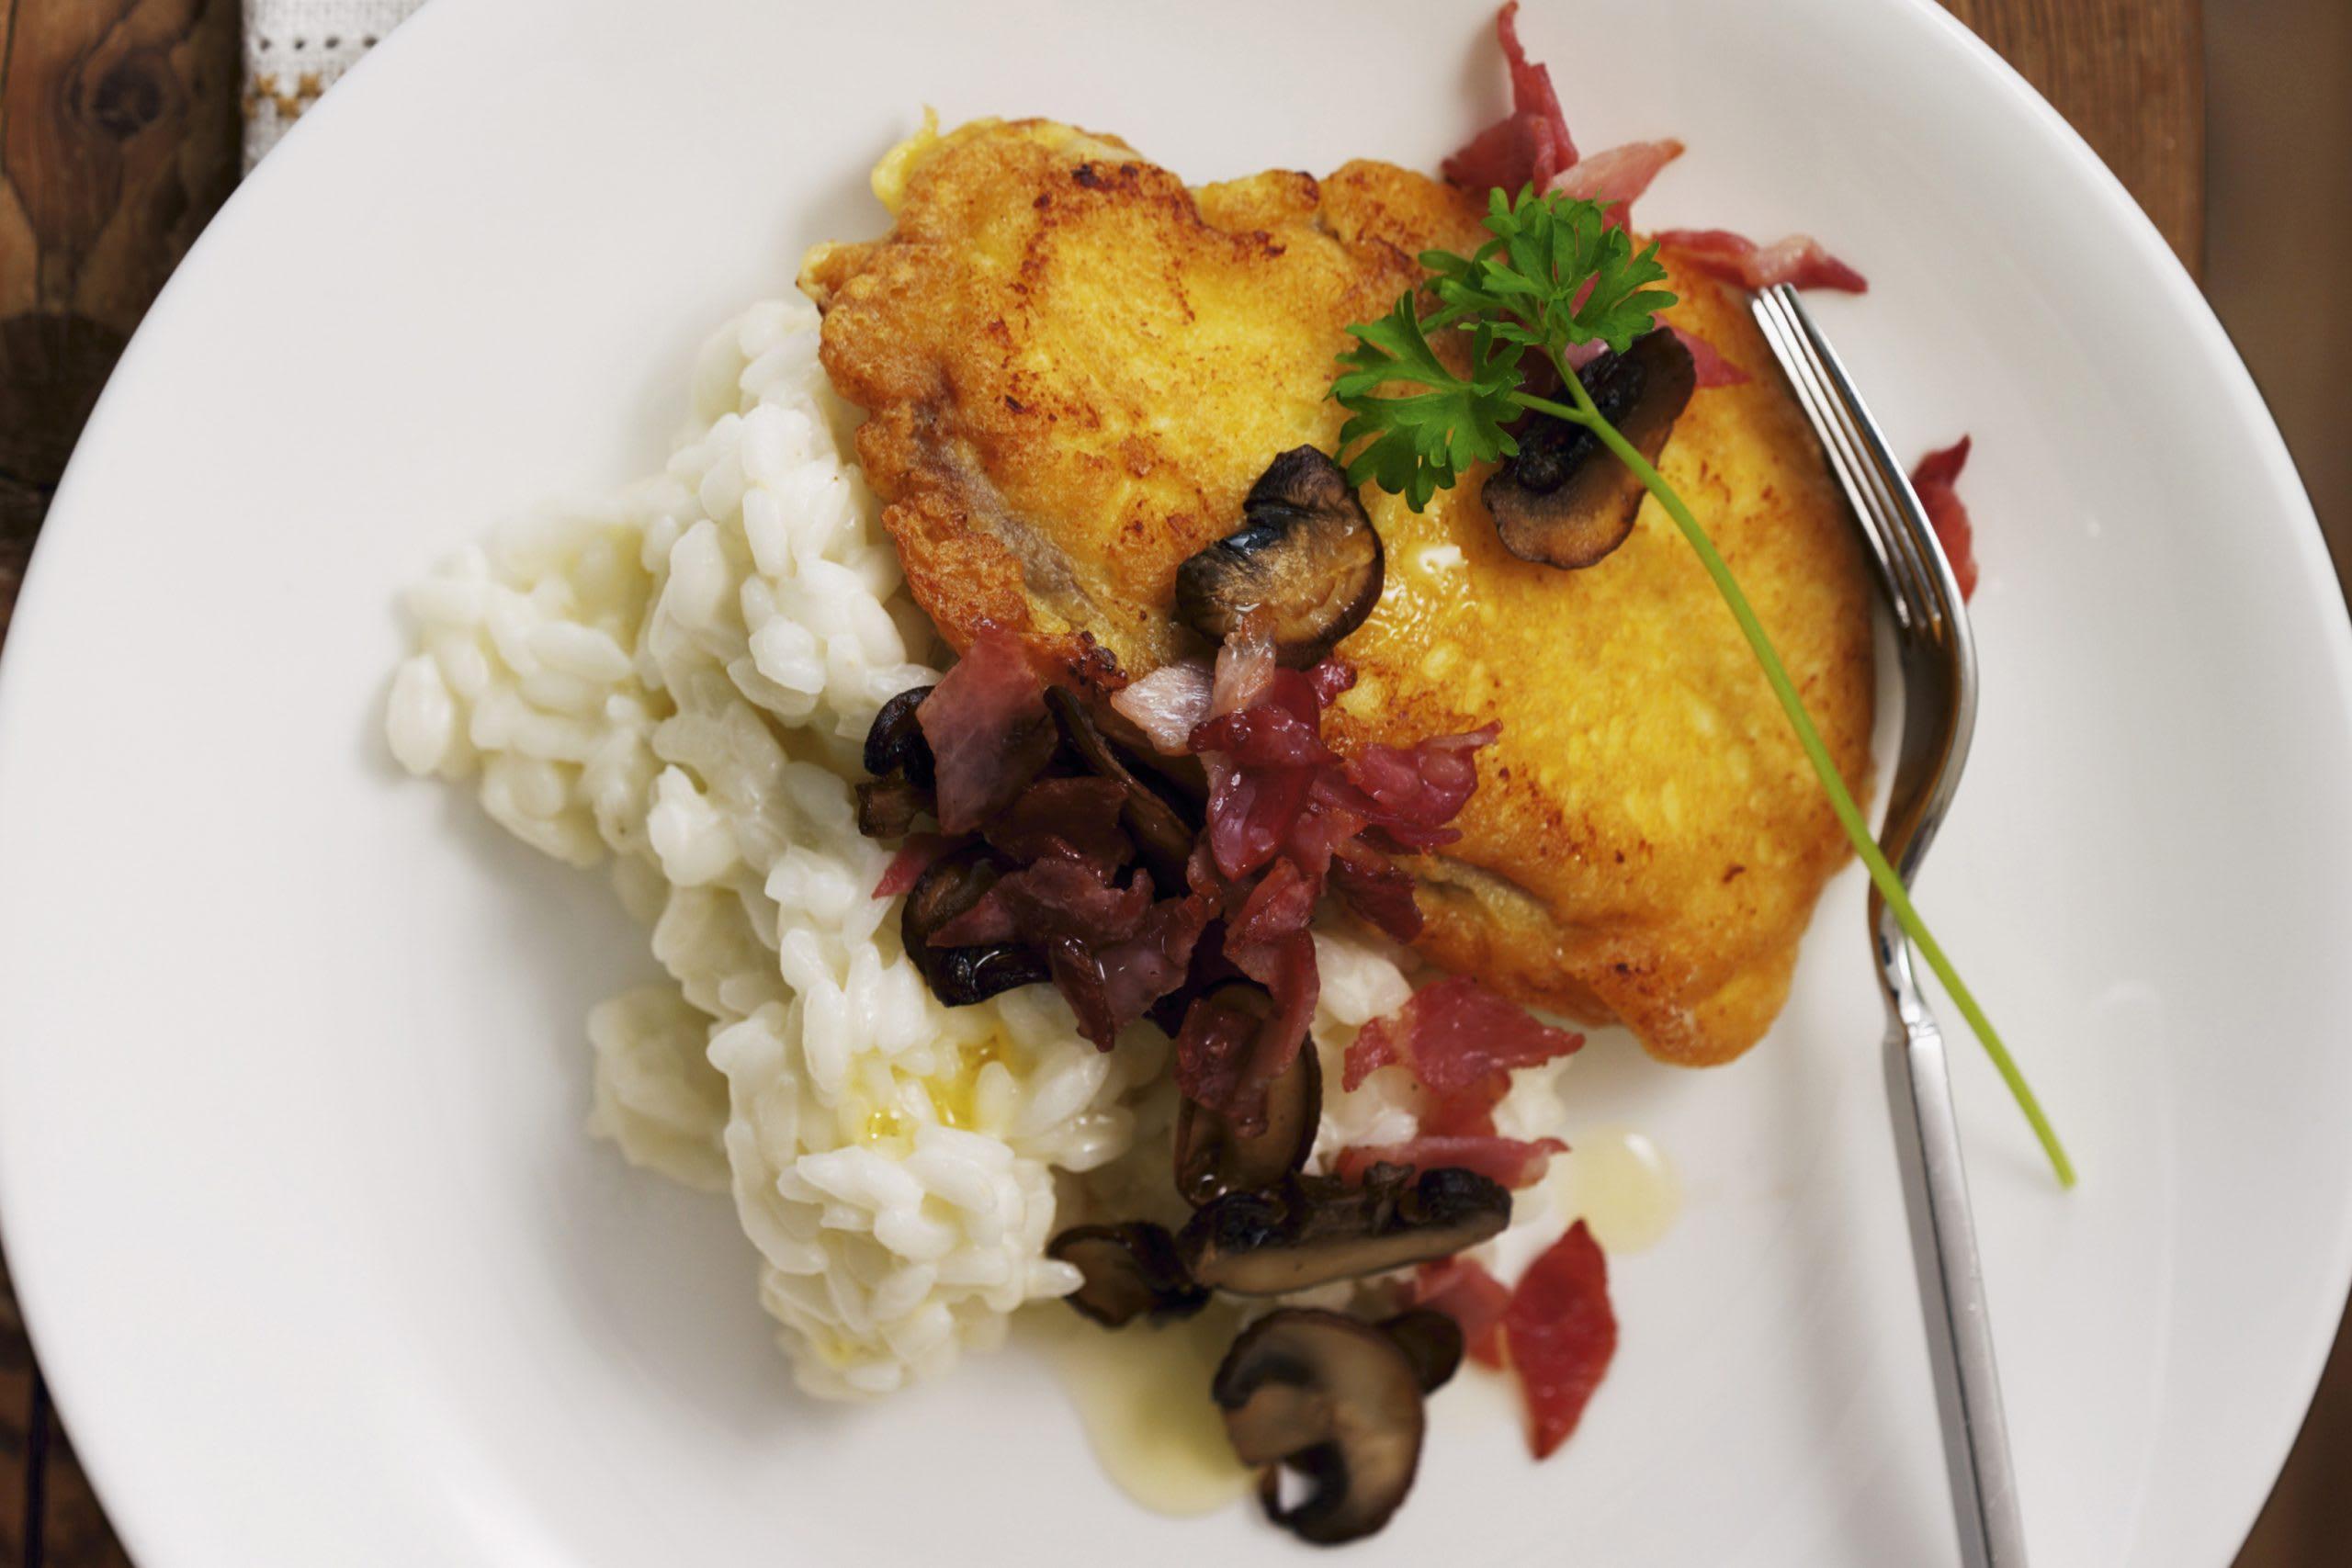 Piccata jambon-champignons et risotto au vin blanc